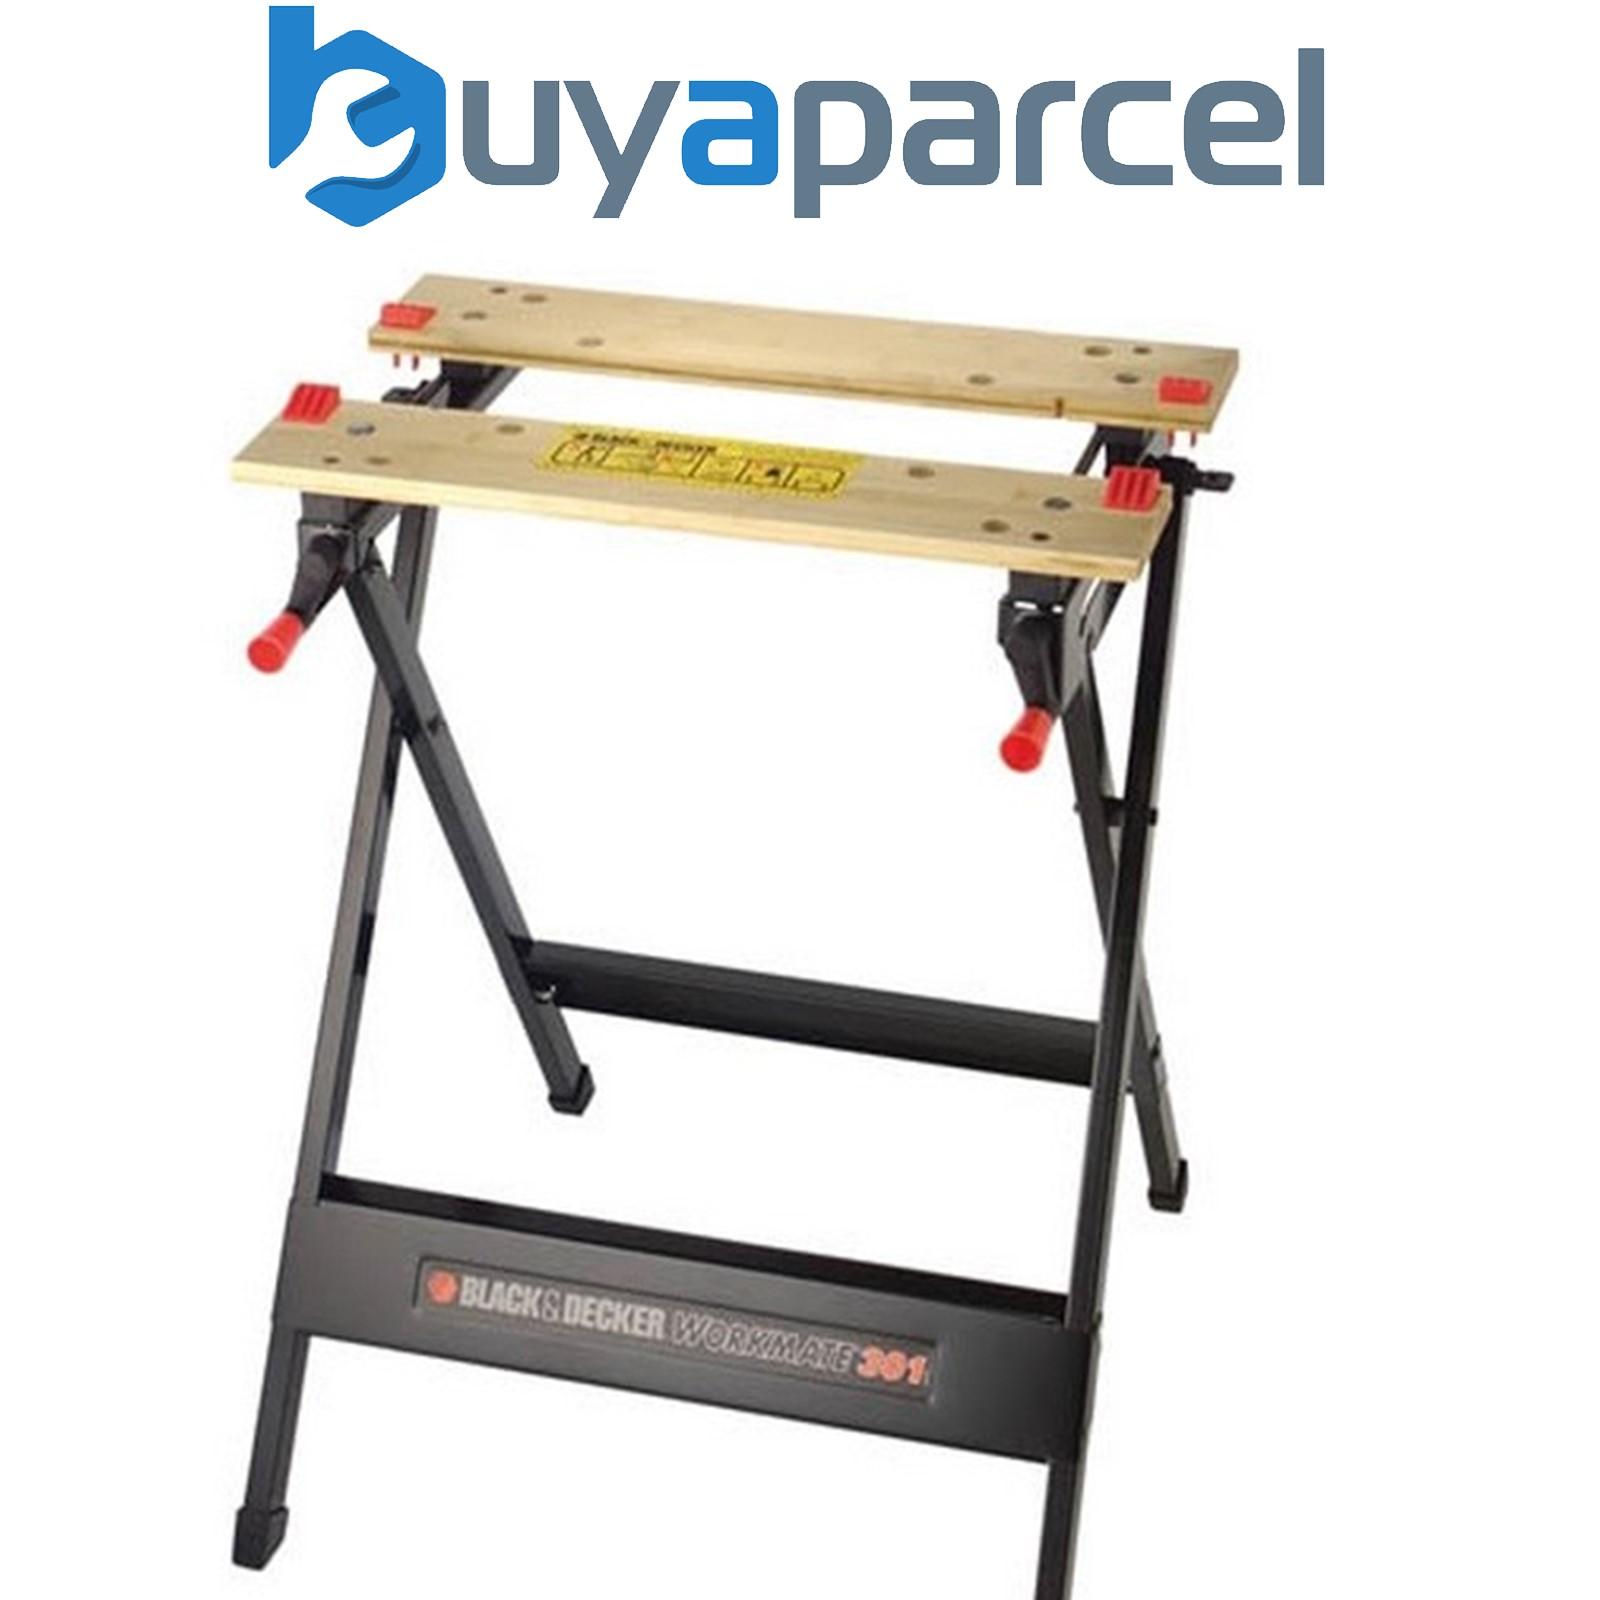 Black And Decker Wm301 Series Workmate Work Bench Vice Stand Saw Horse Wm301 Xj Ebay